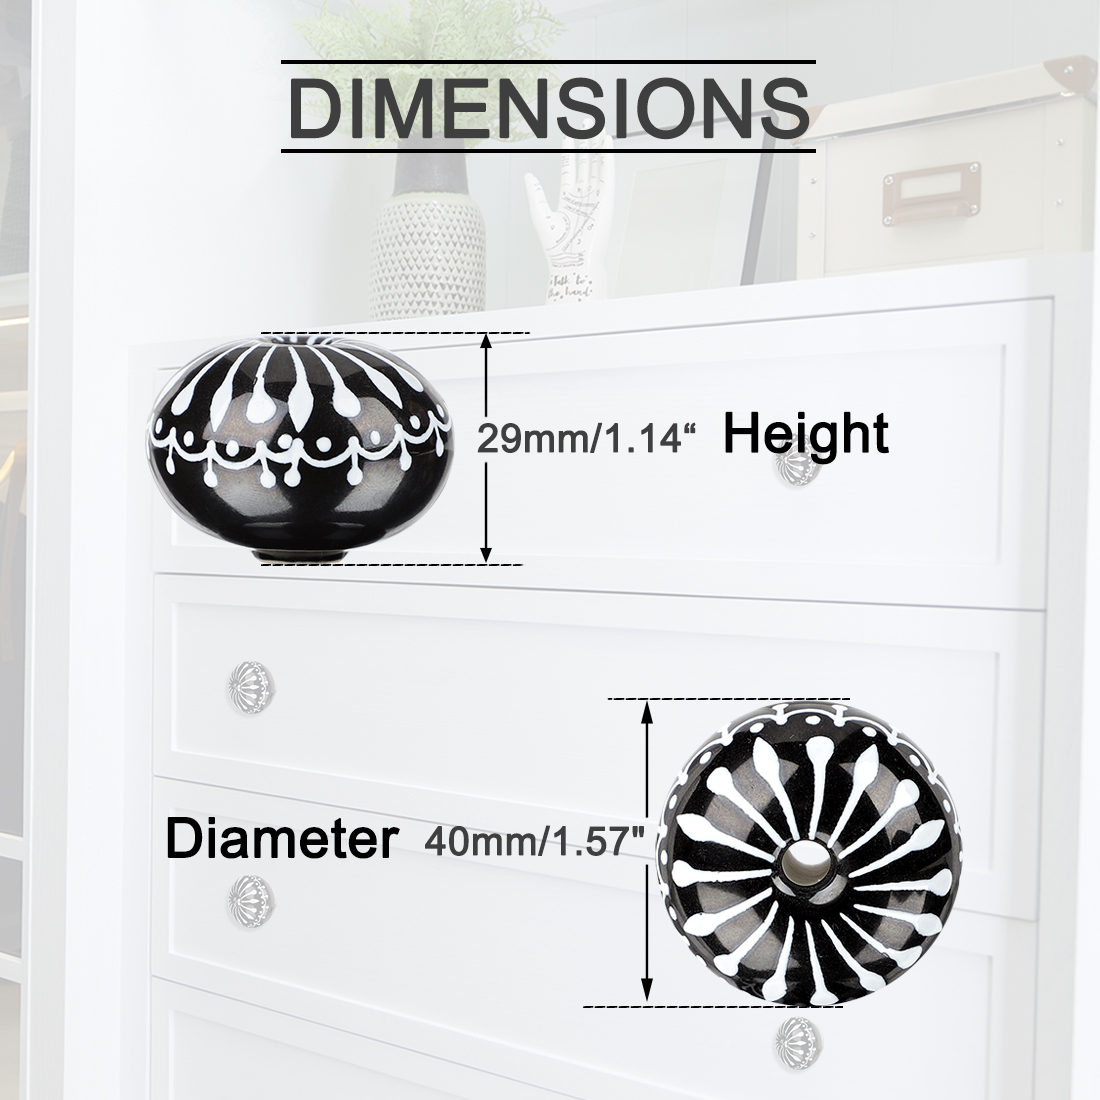 40mm Ceramic Knobs Round Drawer Pull Handle Wardrobe Door Accessories 4pcs #1 - image 2 de 7